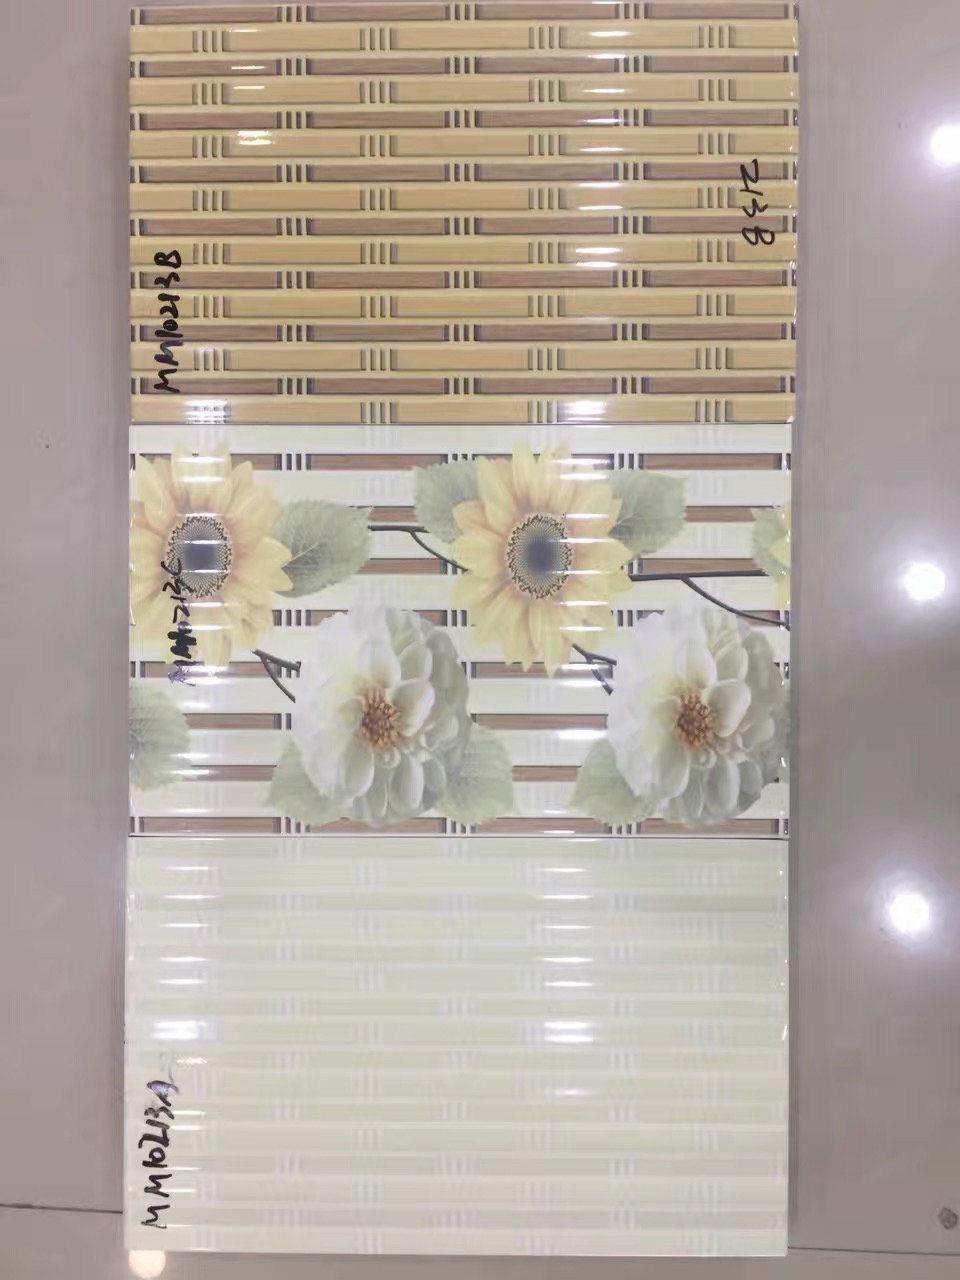 Hot Item Wall Tiles Bathroom Tile Kitchen Wall Tiles Cheap Tiles